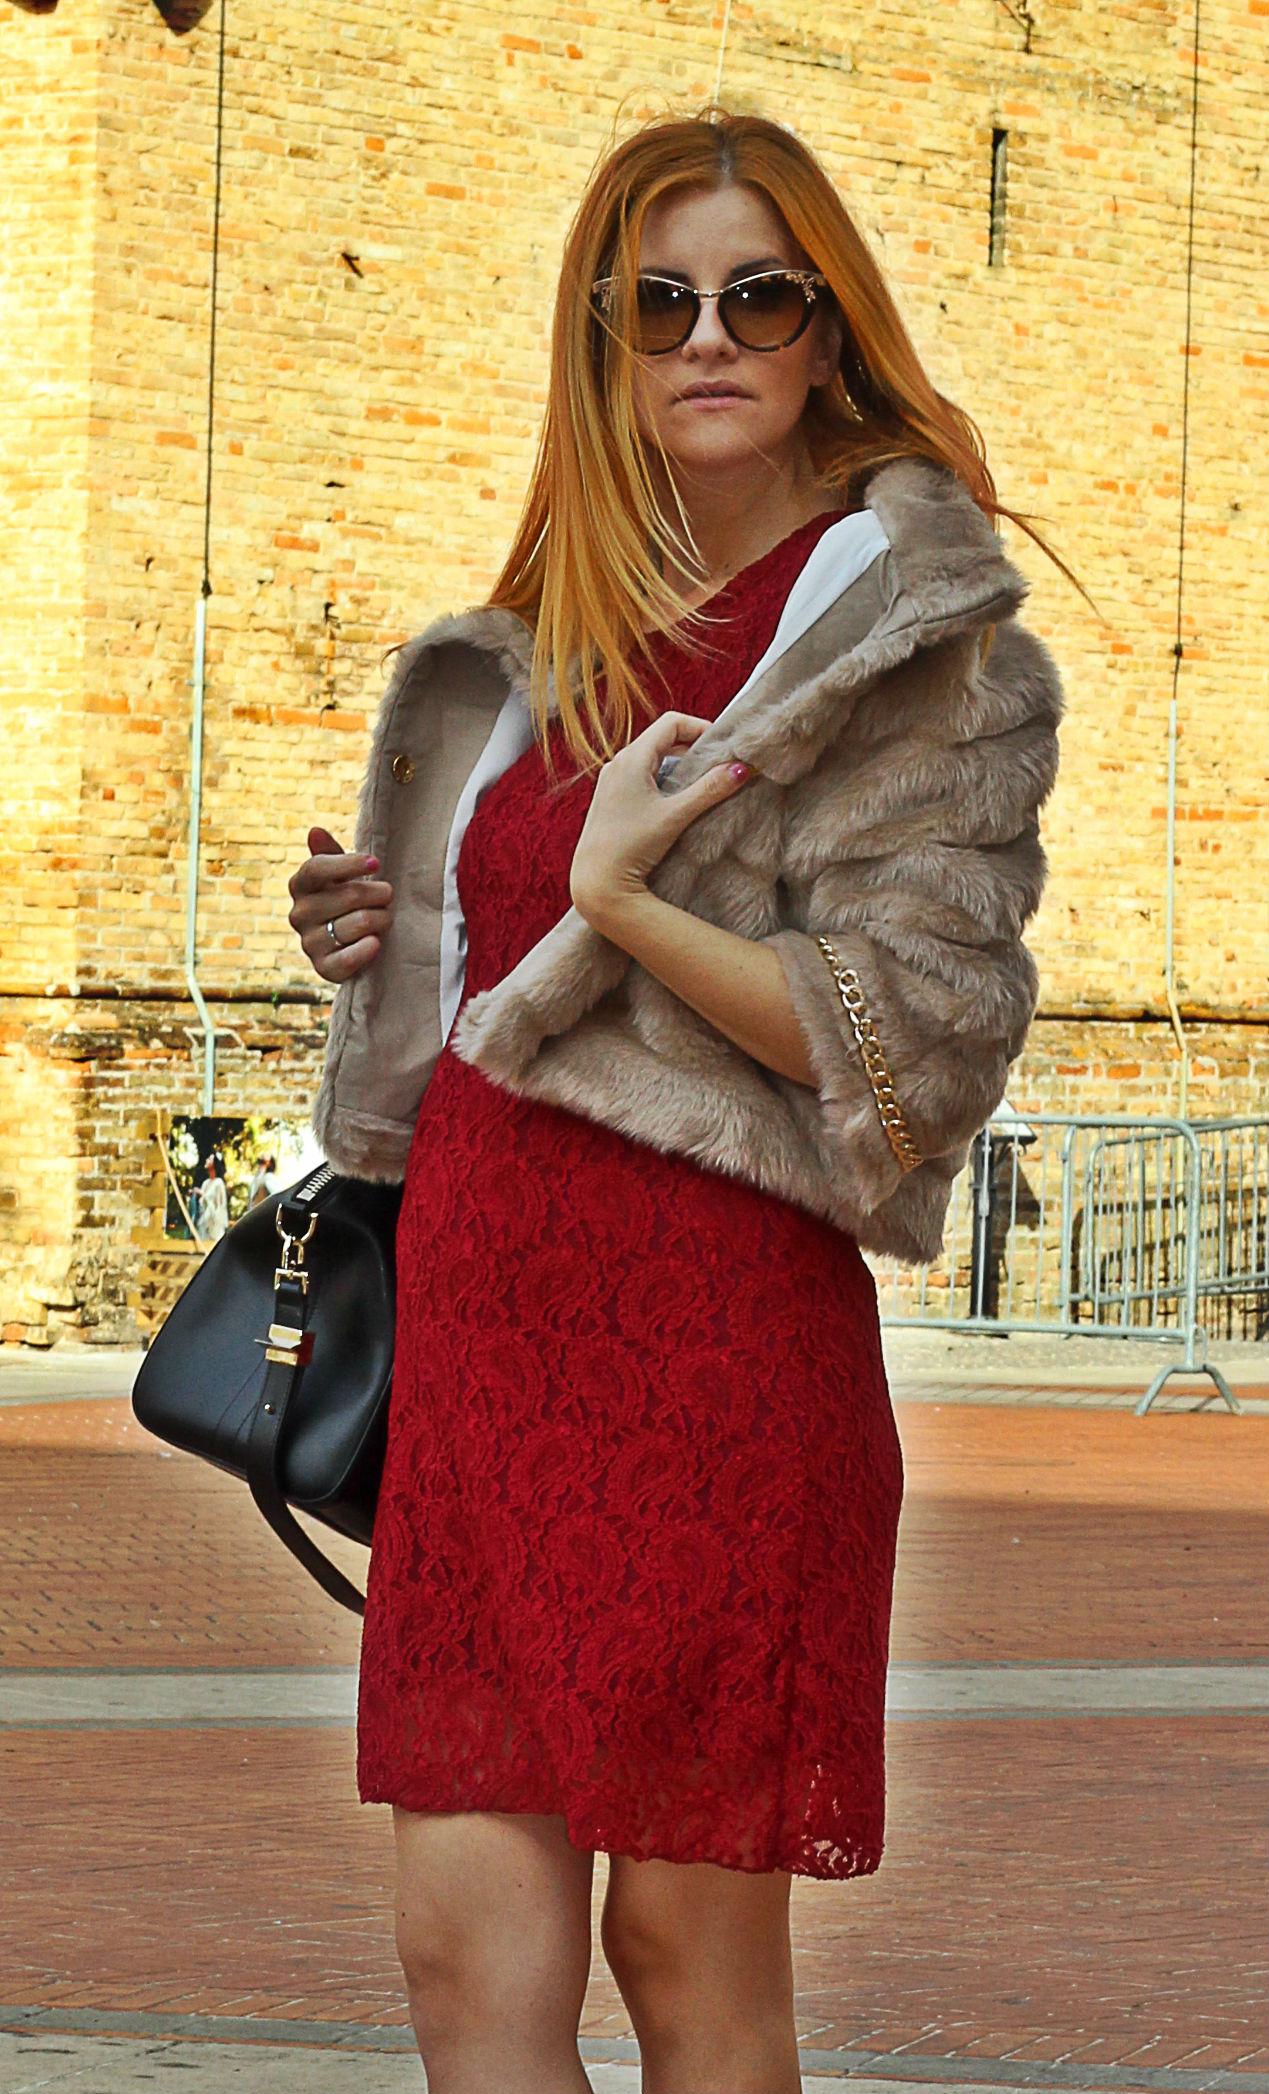 elisabetta bertolini fashion blogger italia recanati abito indeependent